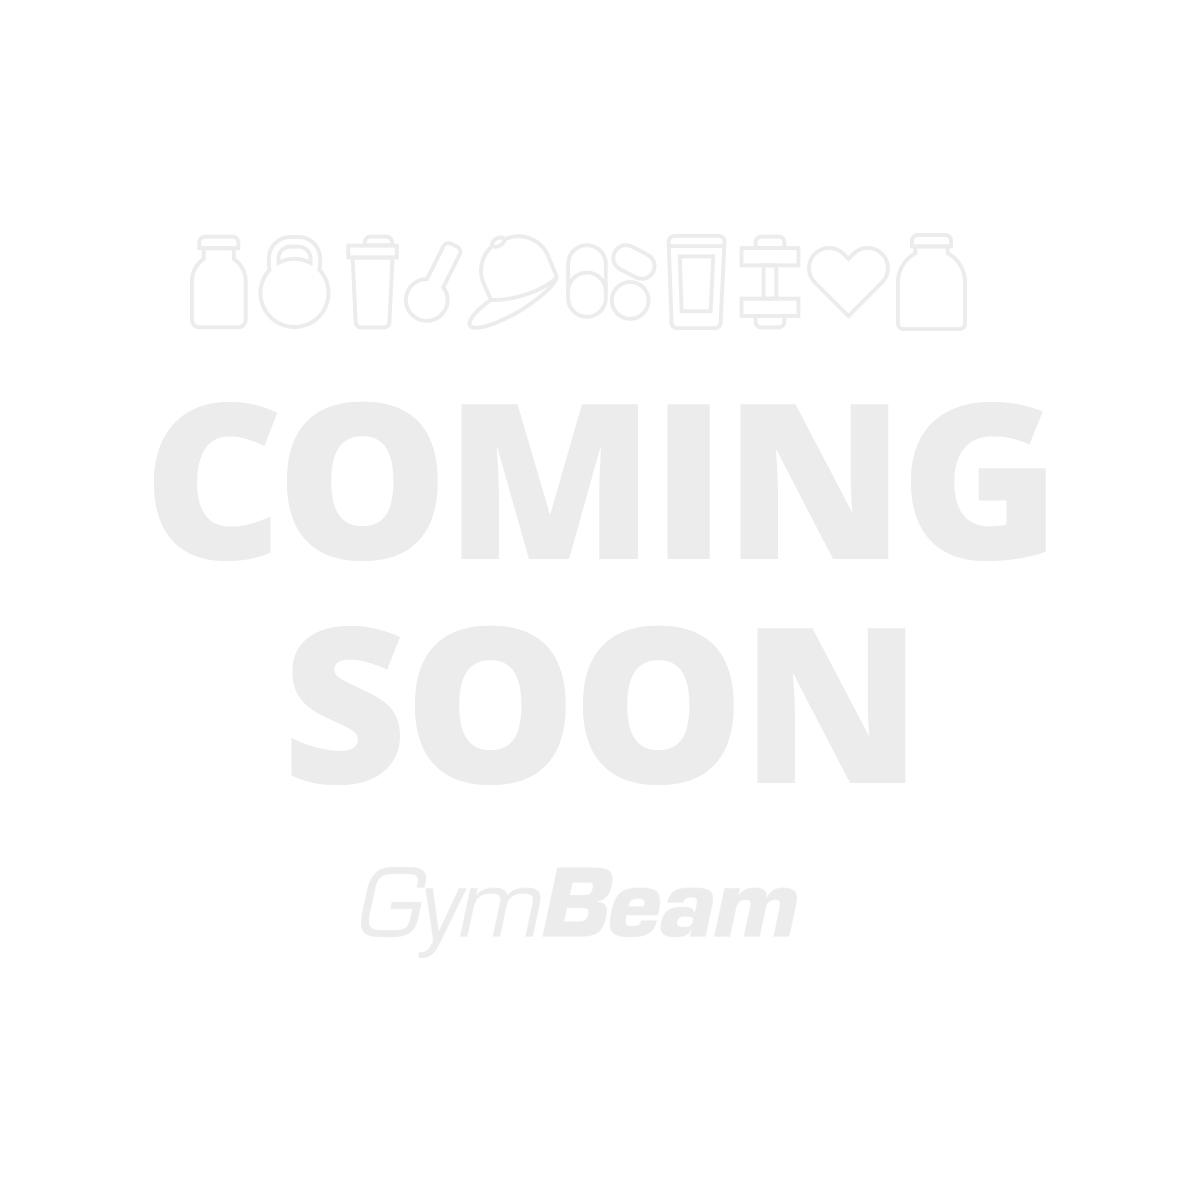 C4 Original edzés előtti stimuláns - Cellucor